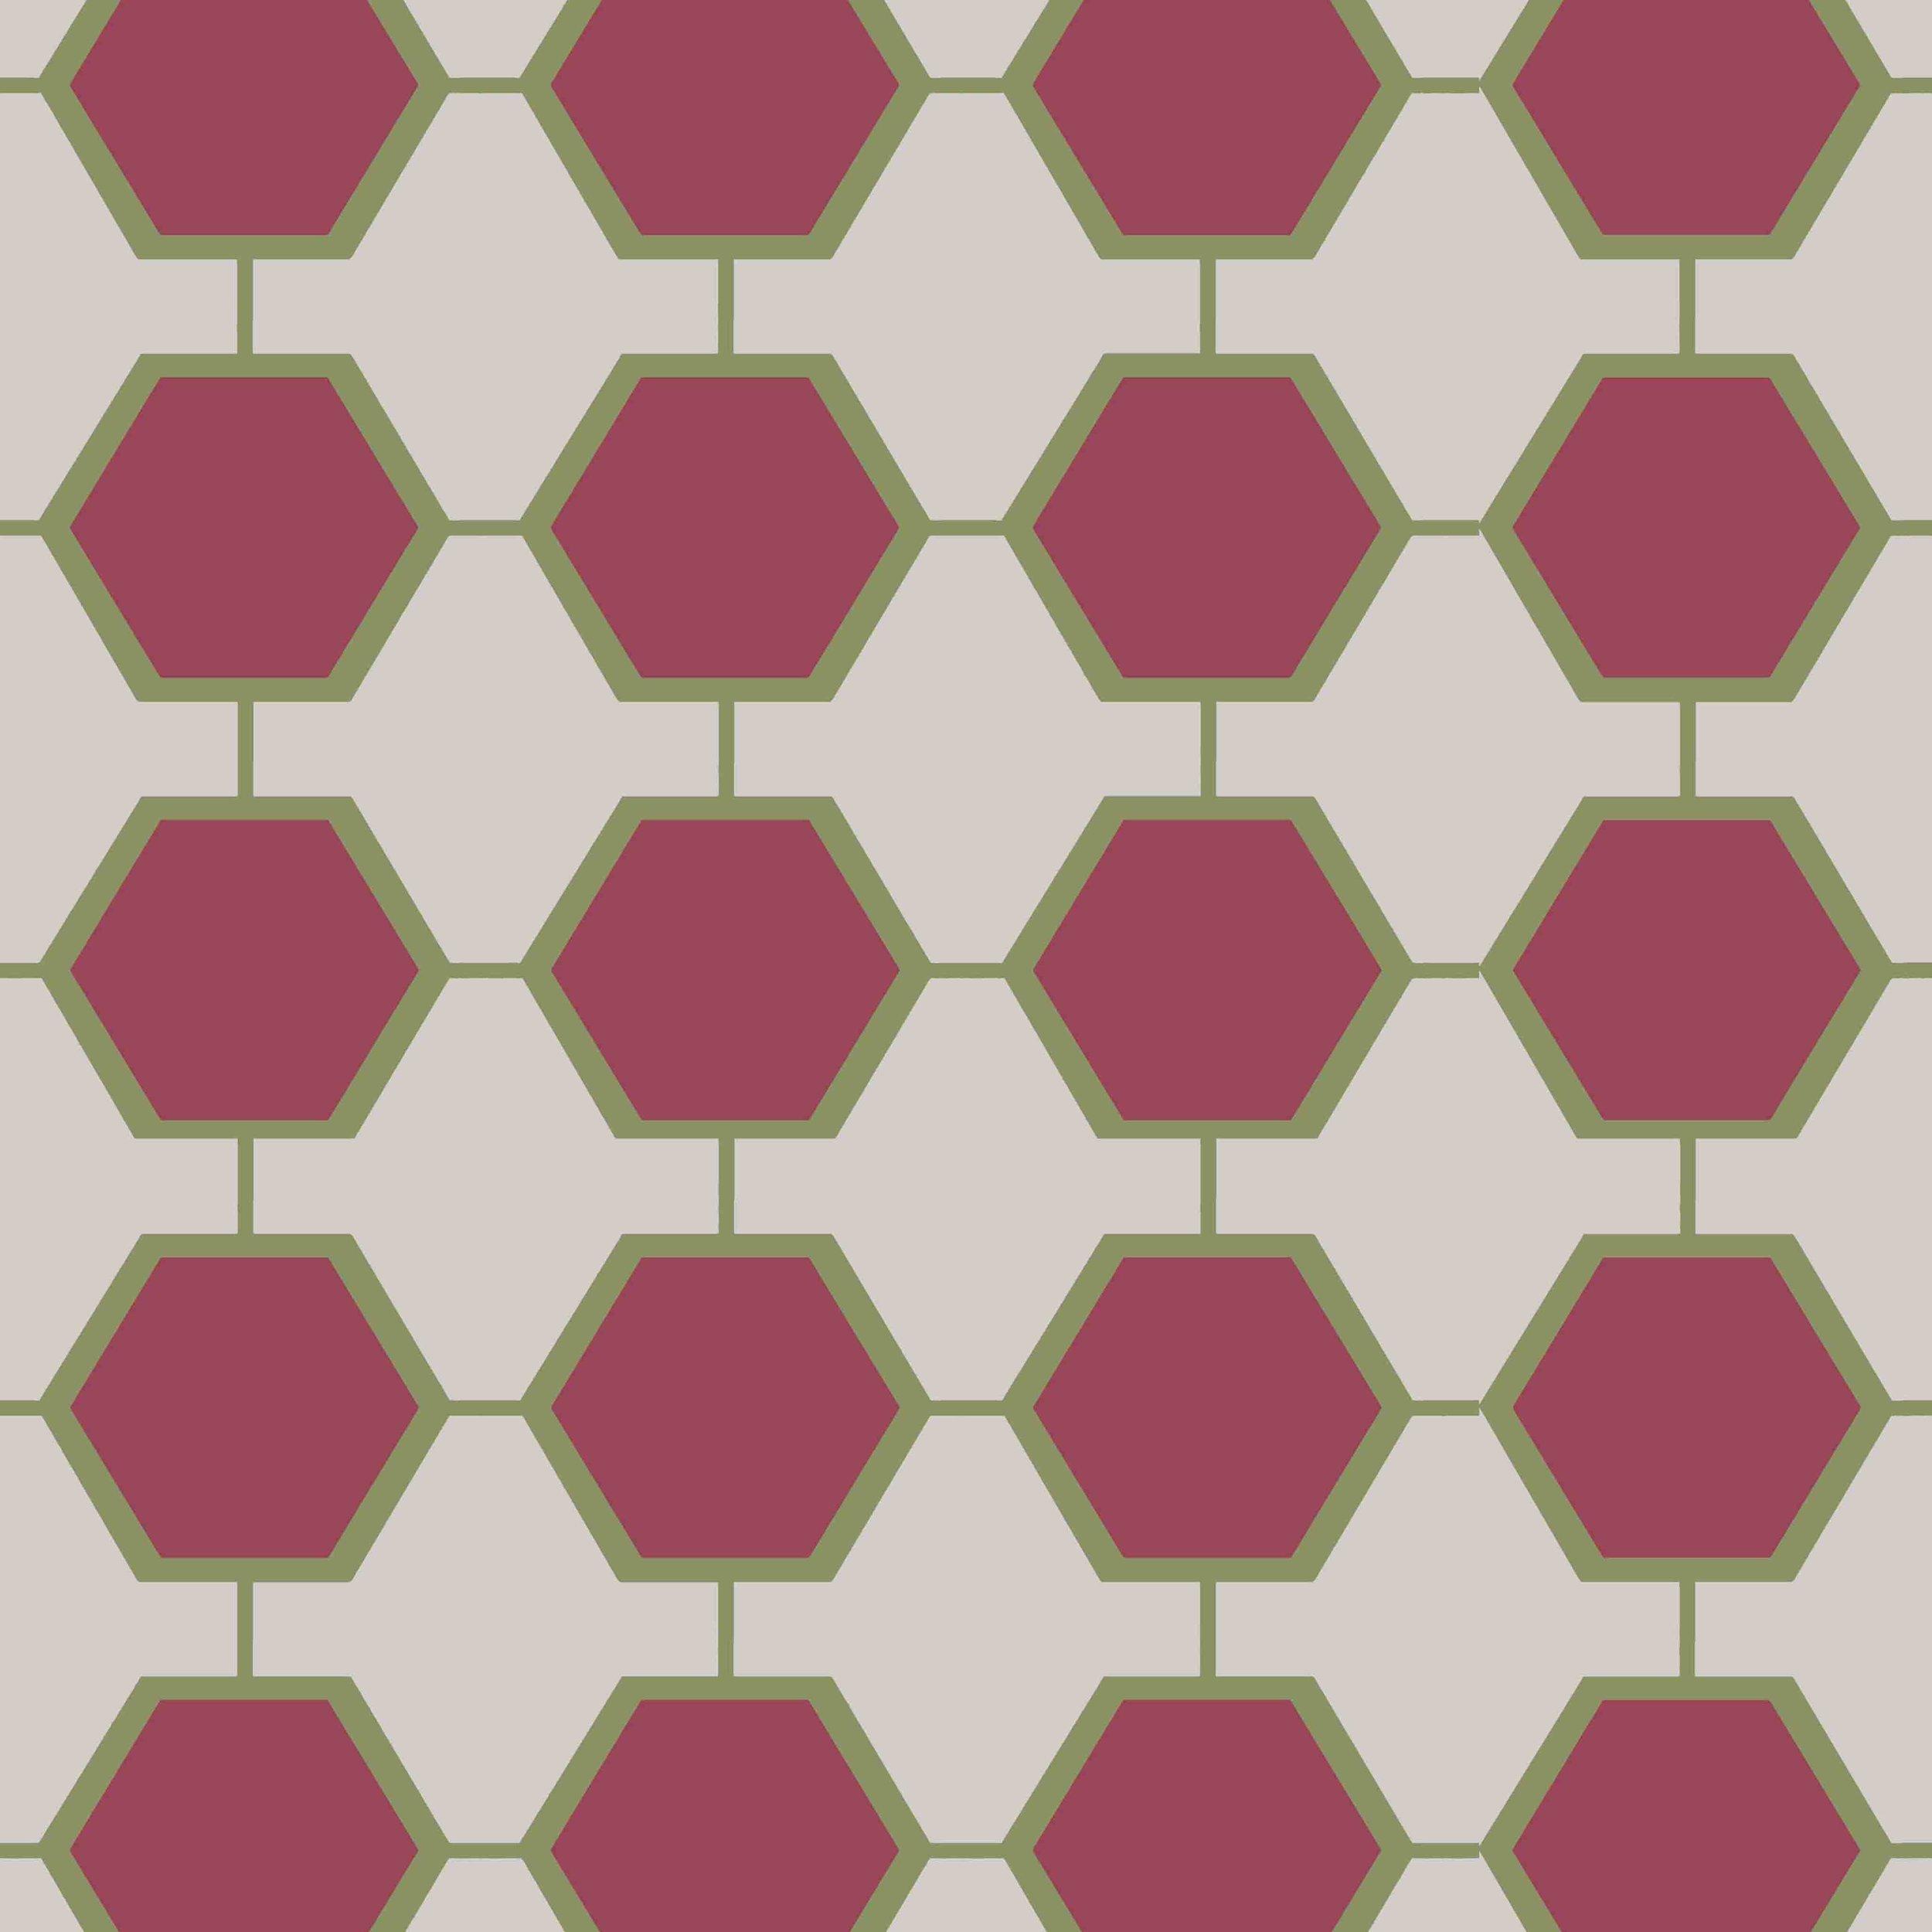 Geometric_beige_pink_green_crop.jpg